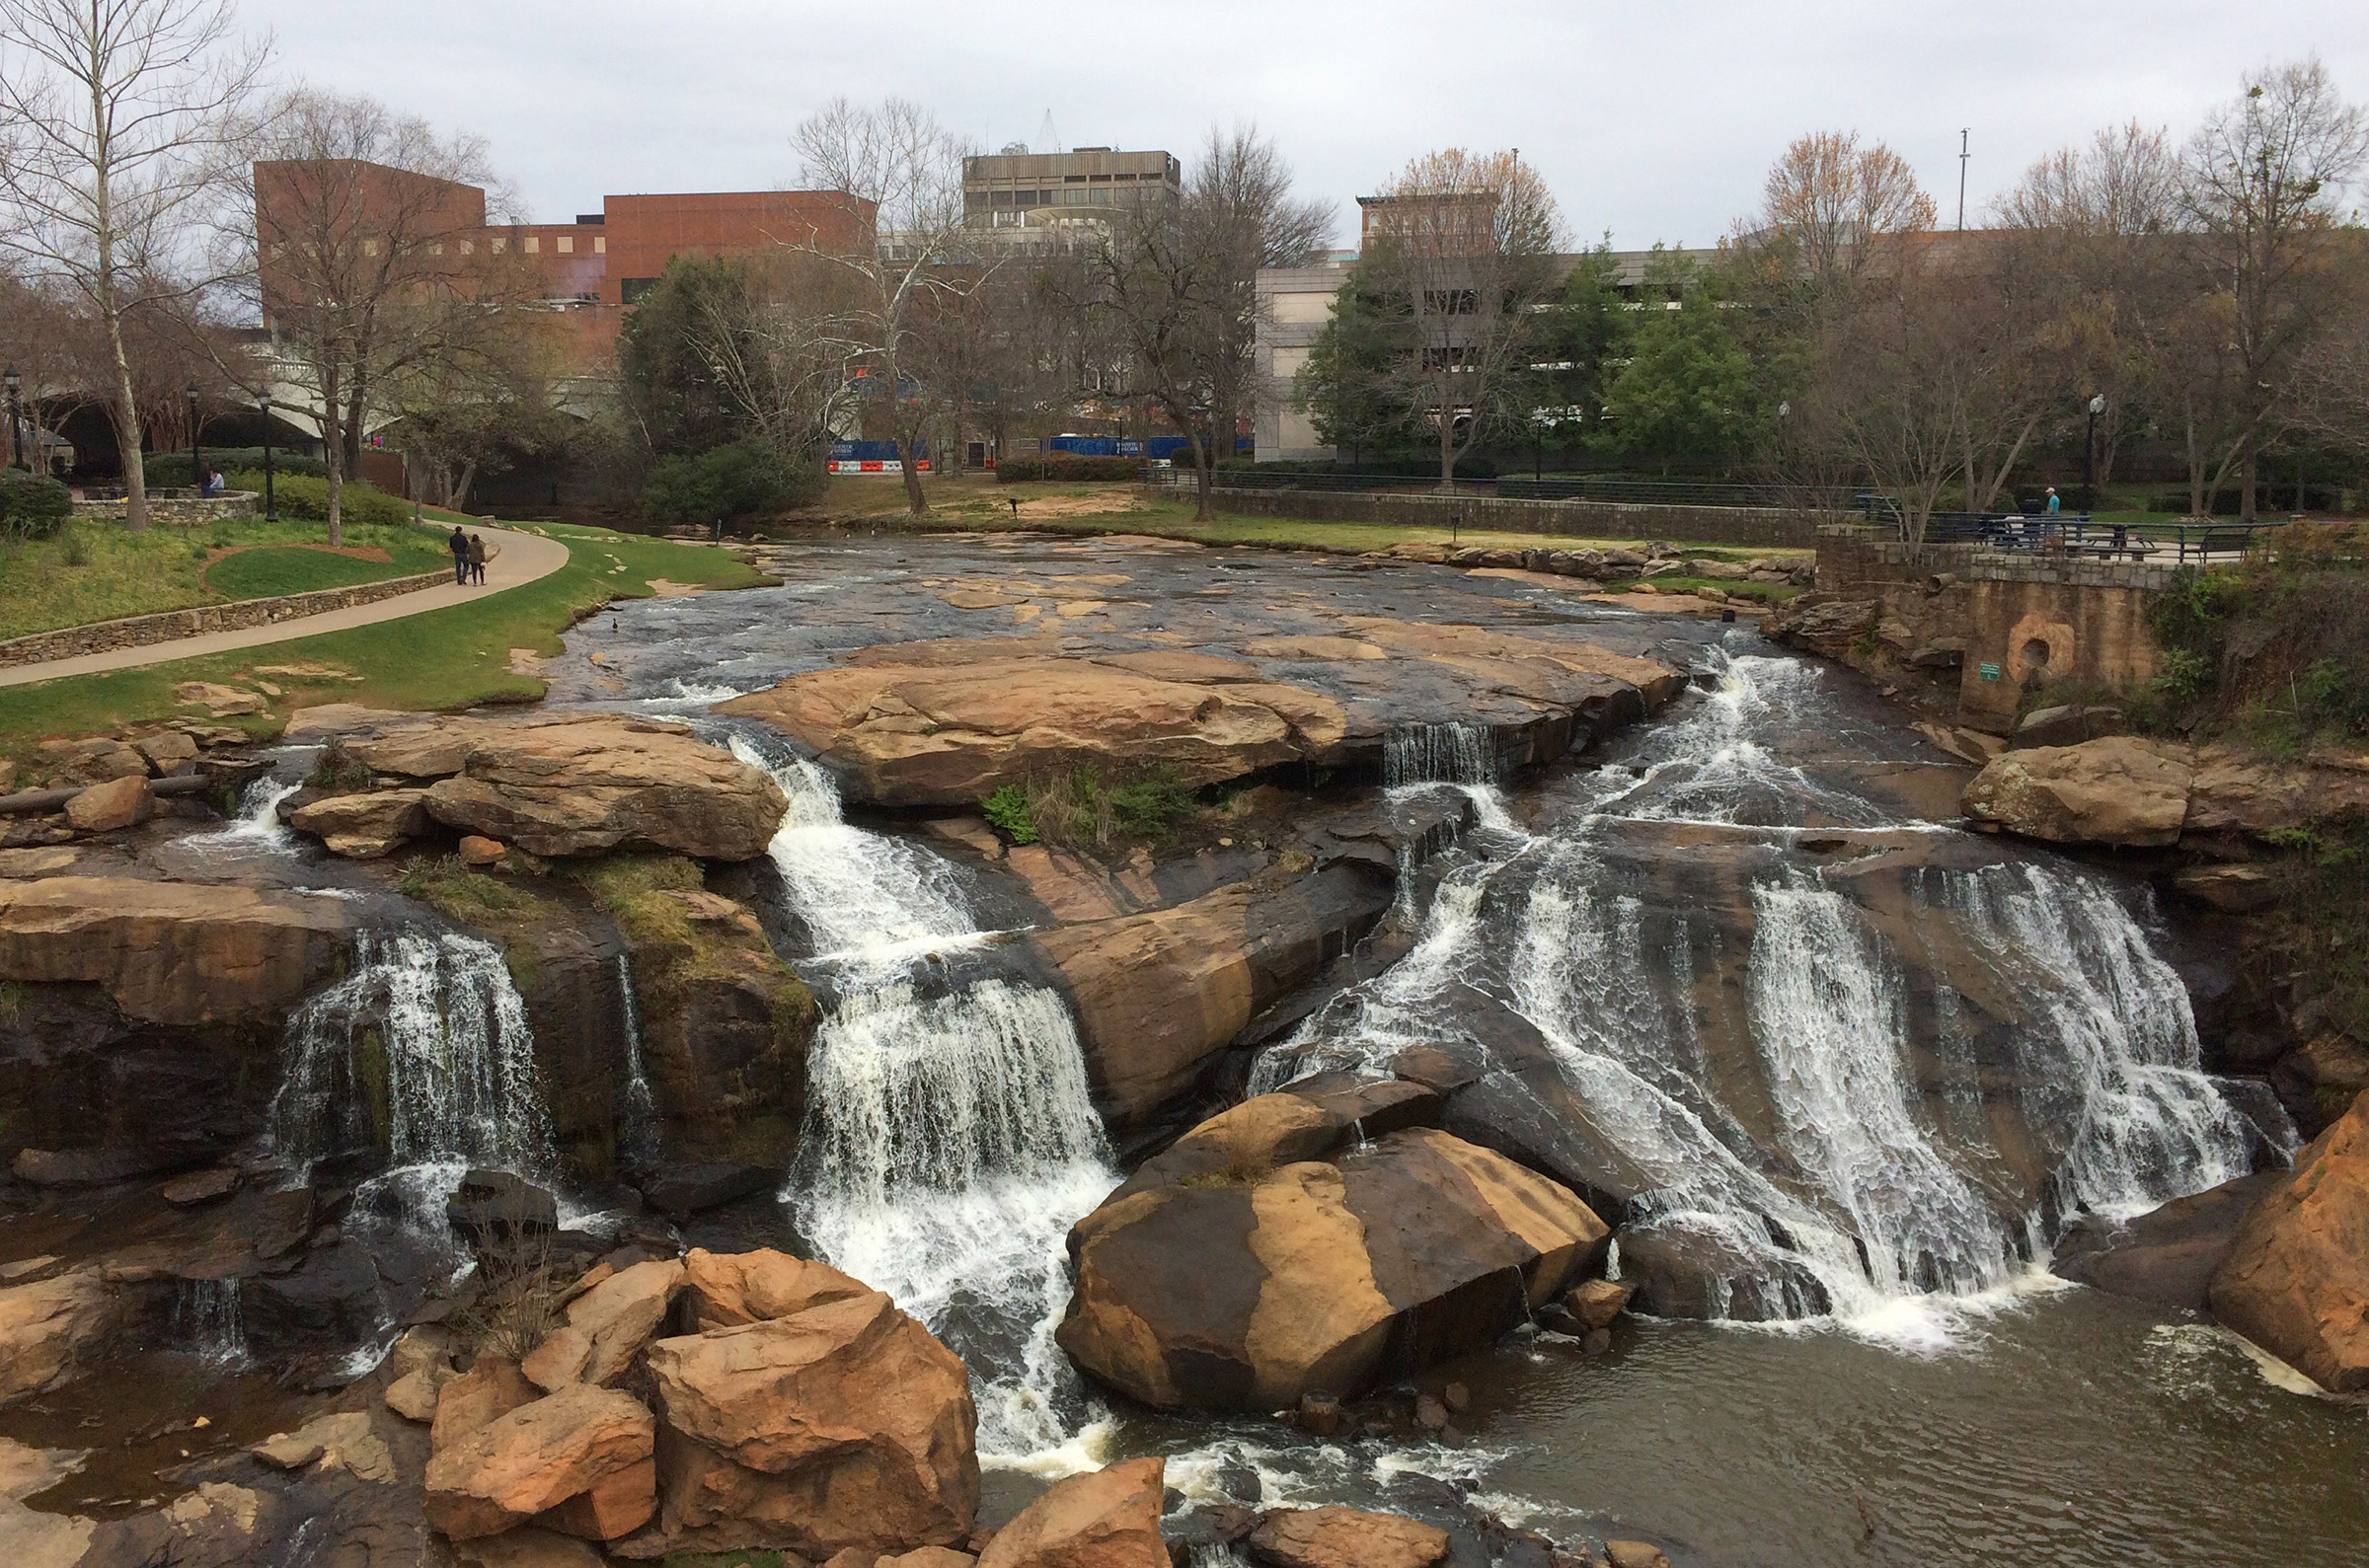 Mla Students Tour Downtown Greenville, South Carolina